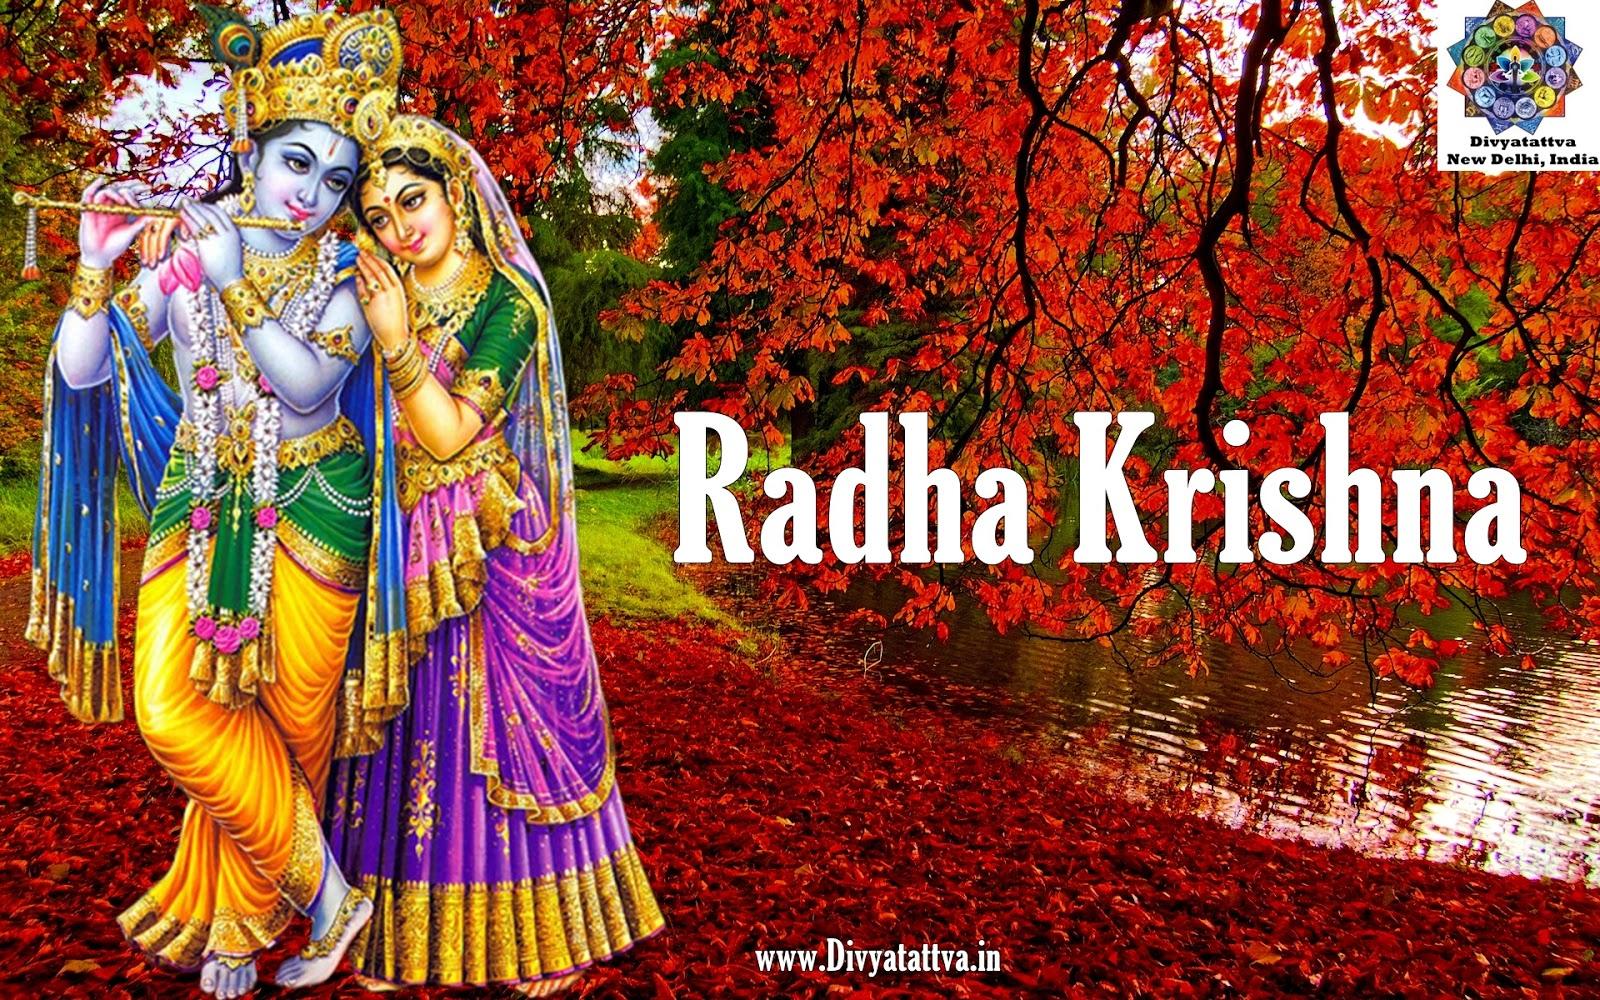 Radha Photos, Krishna Pictures, Radha Krishna Wallpapers - Radha Krishna - HD Wallpaper